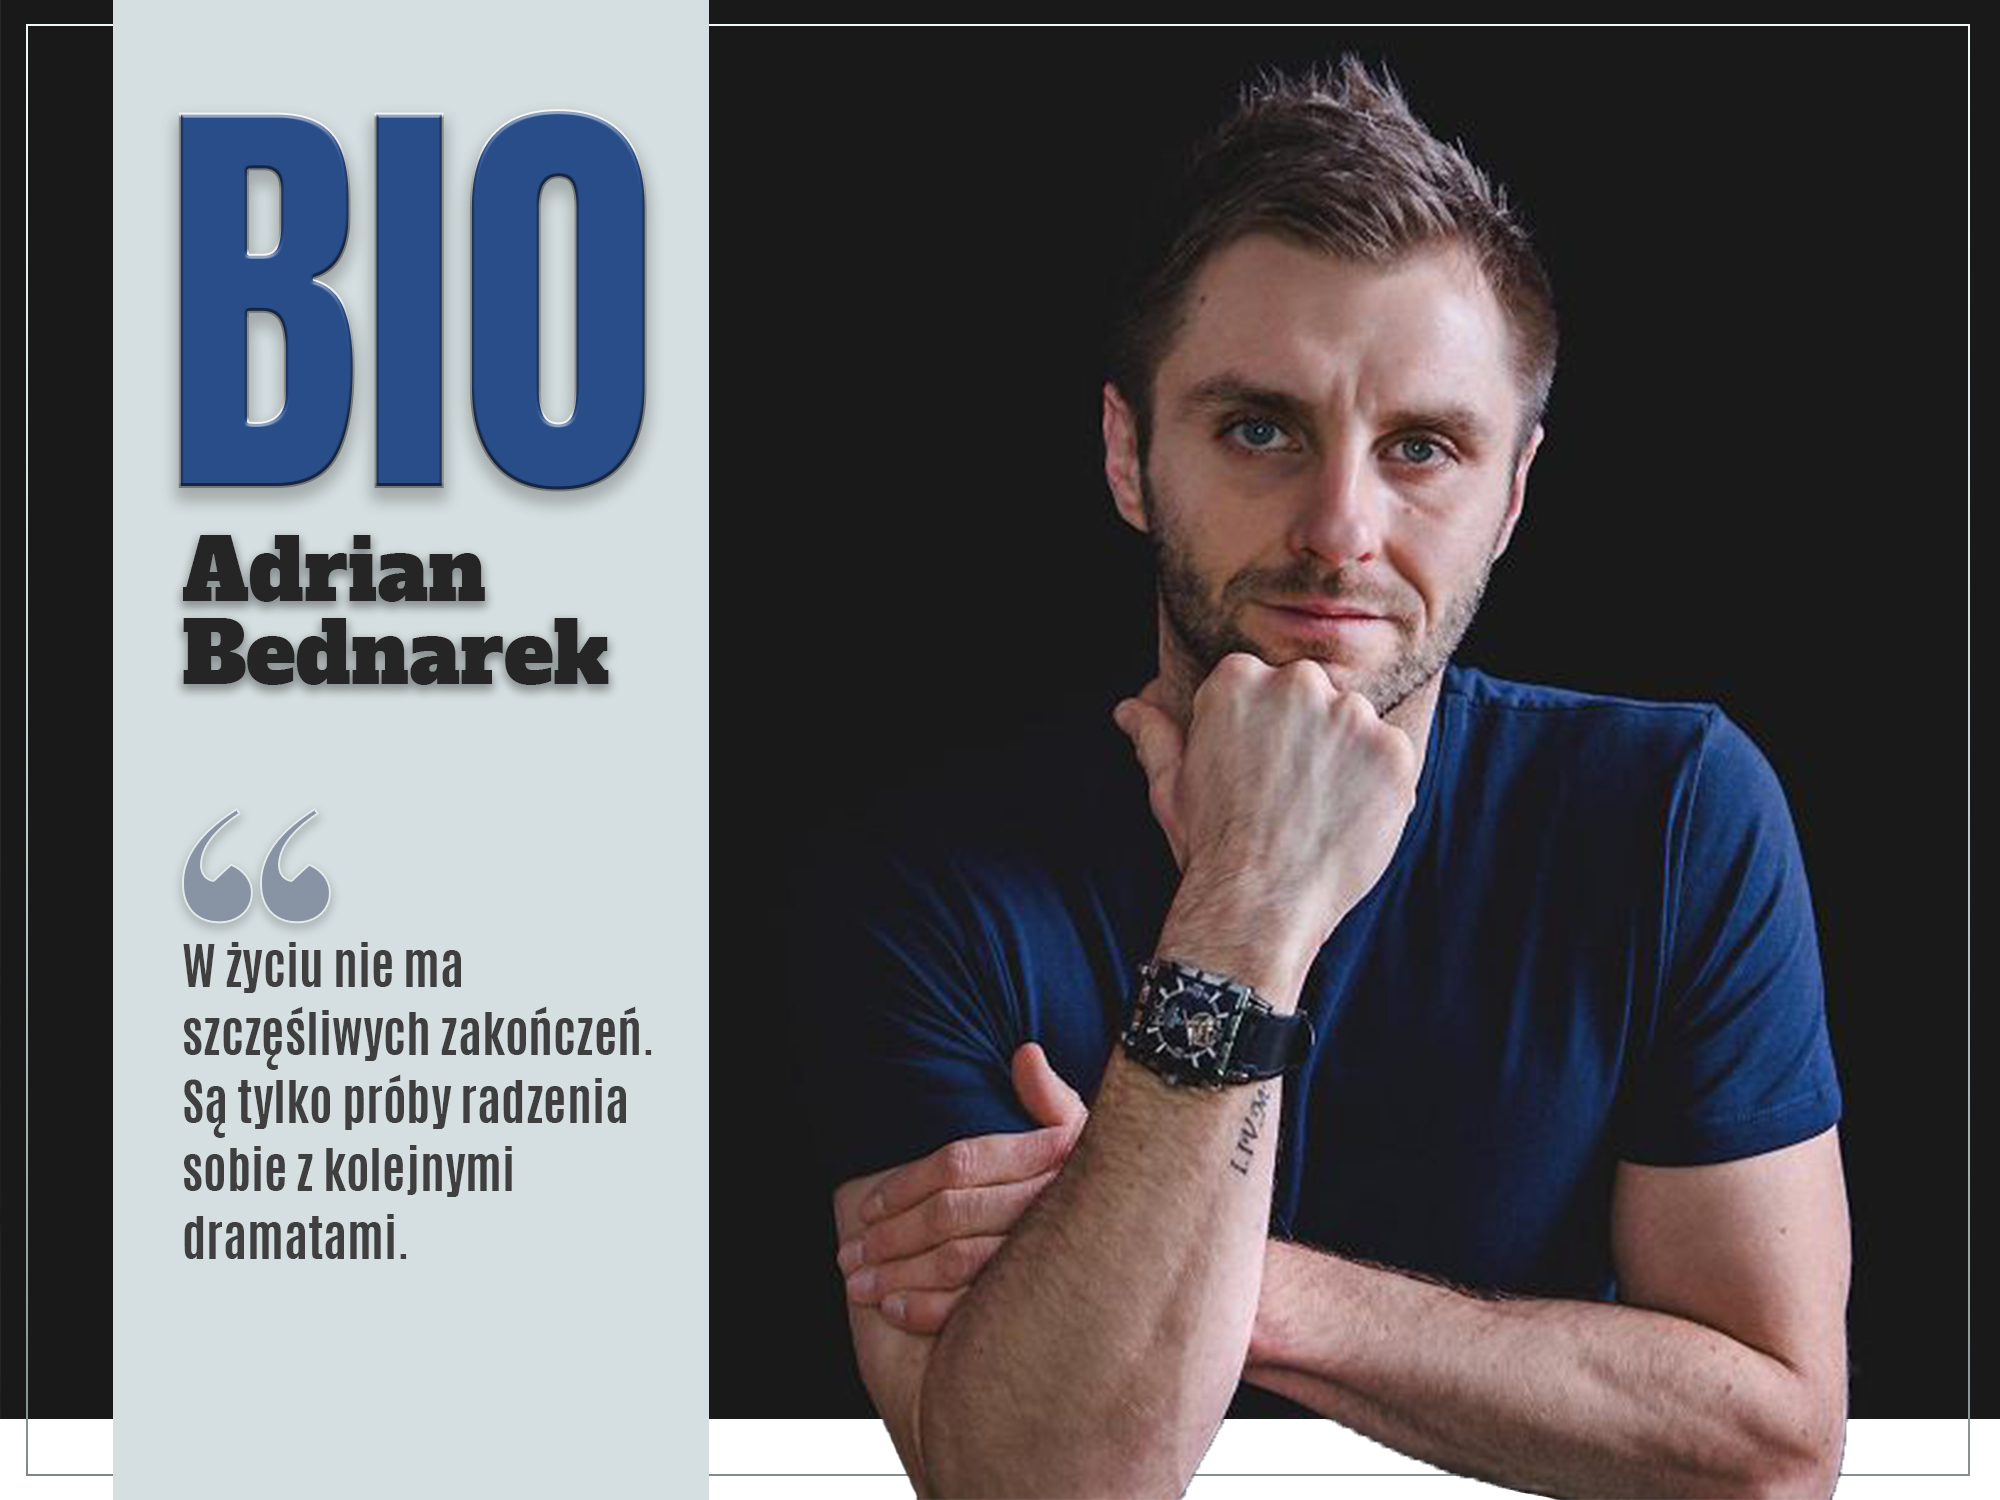 Adrian Bednarek, zaczytanyksiazkoholik.pl